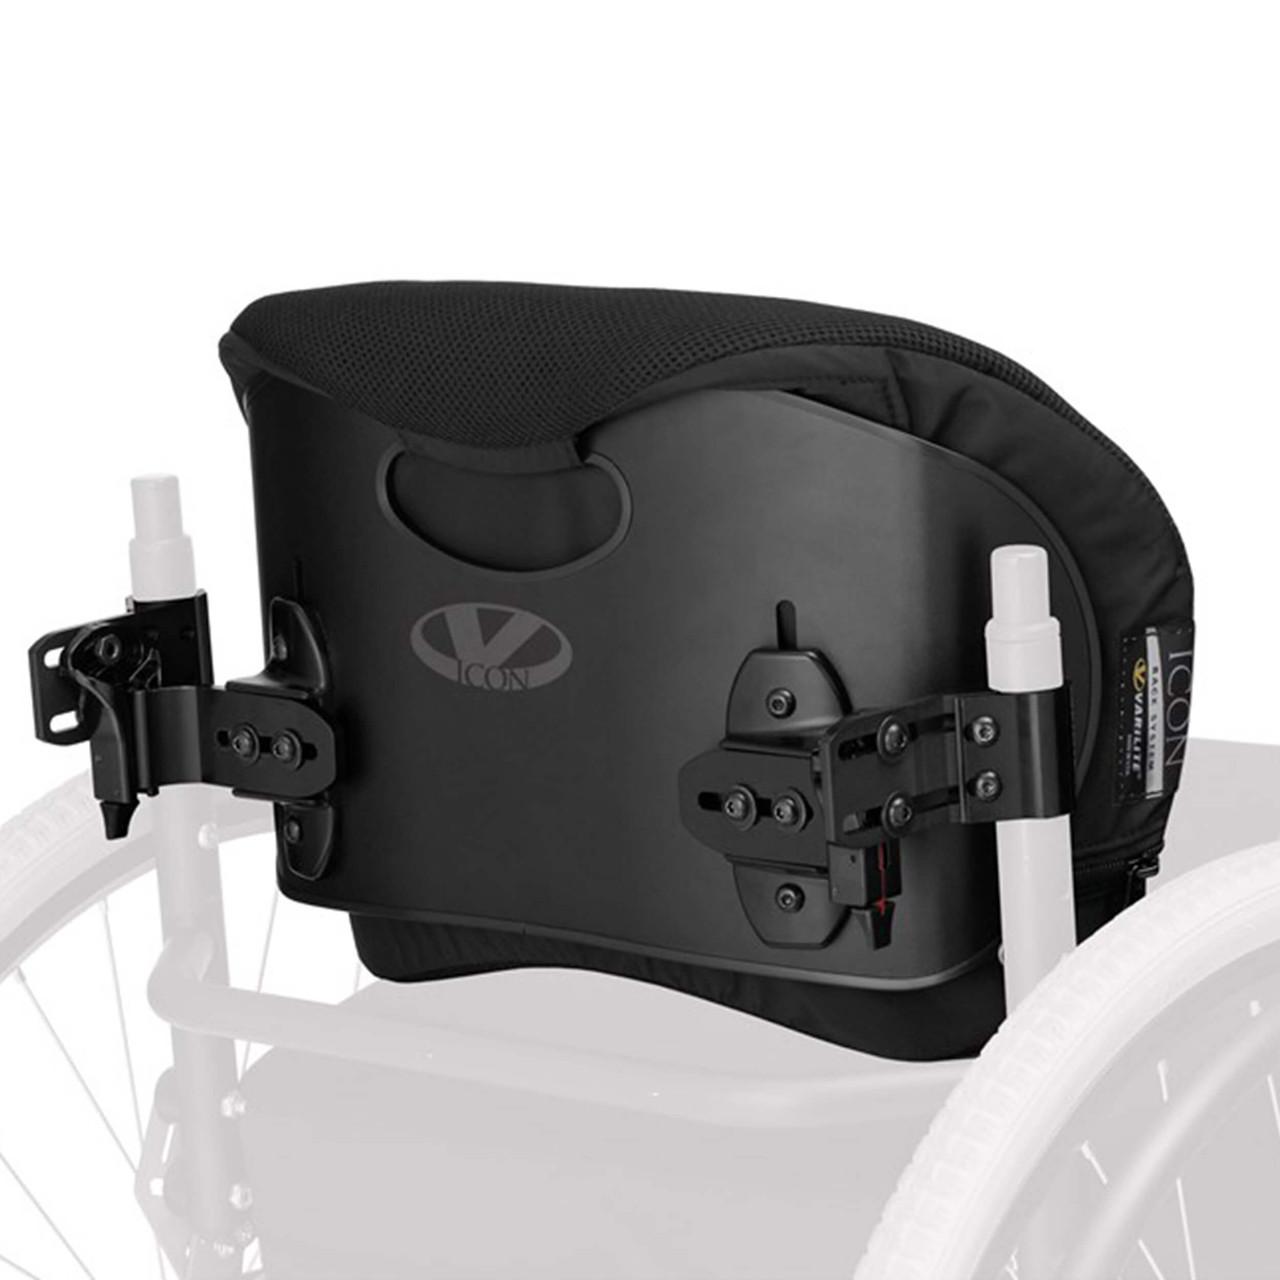 Varilite Cushions and Backrests